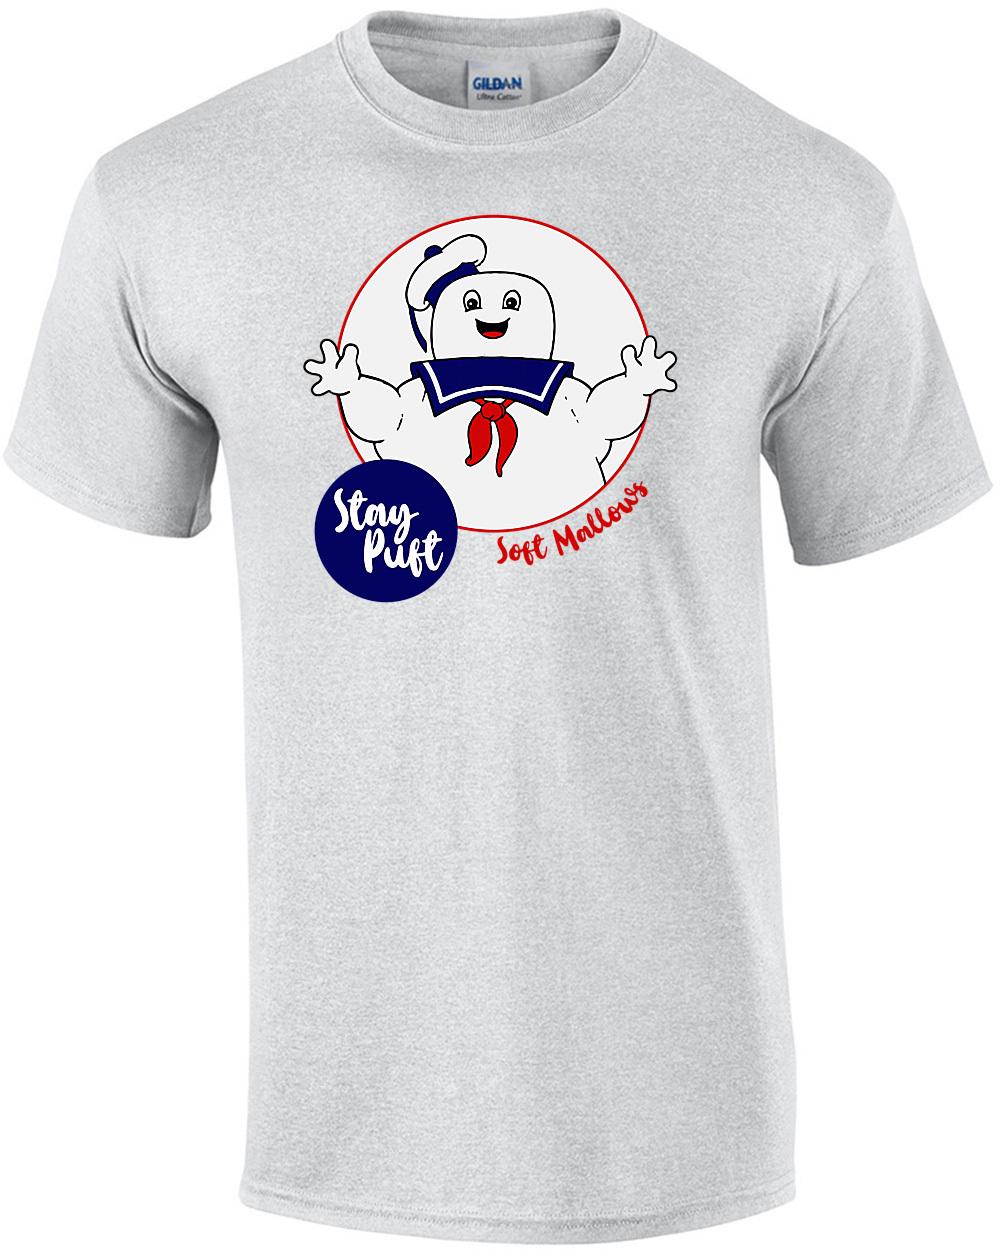 GEEK TEEZ Staypuft Marshmallow Man Mens Tank Top